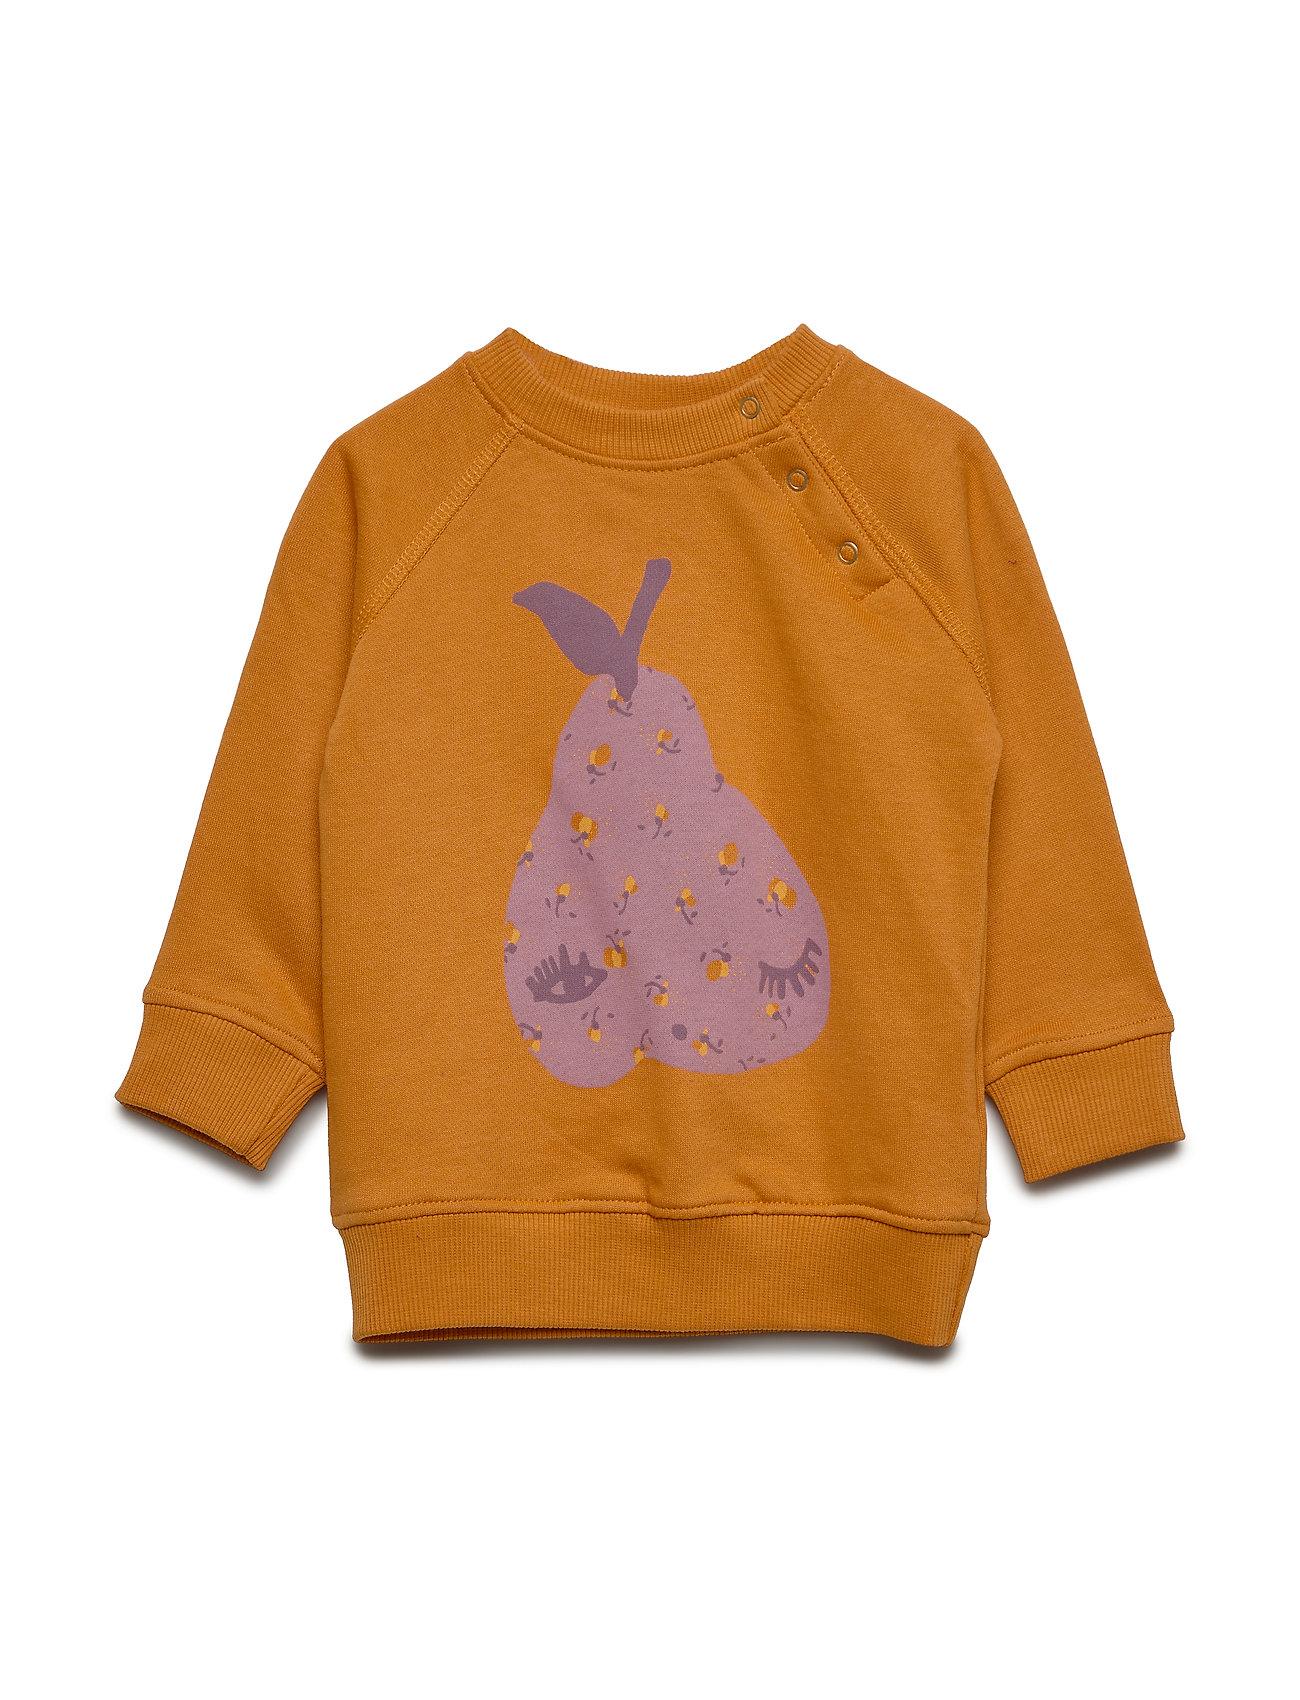 Soft Gallery Alexi Sweatshirt - INCA GOLD, PEARY PETALS